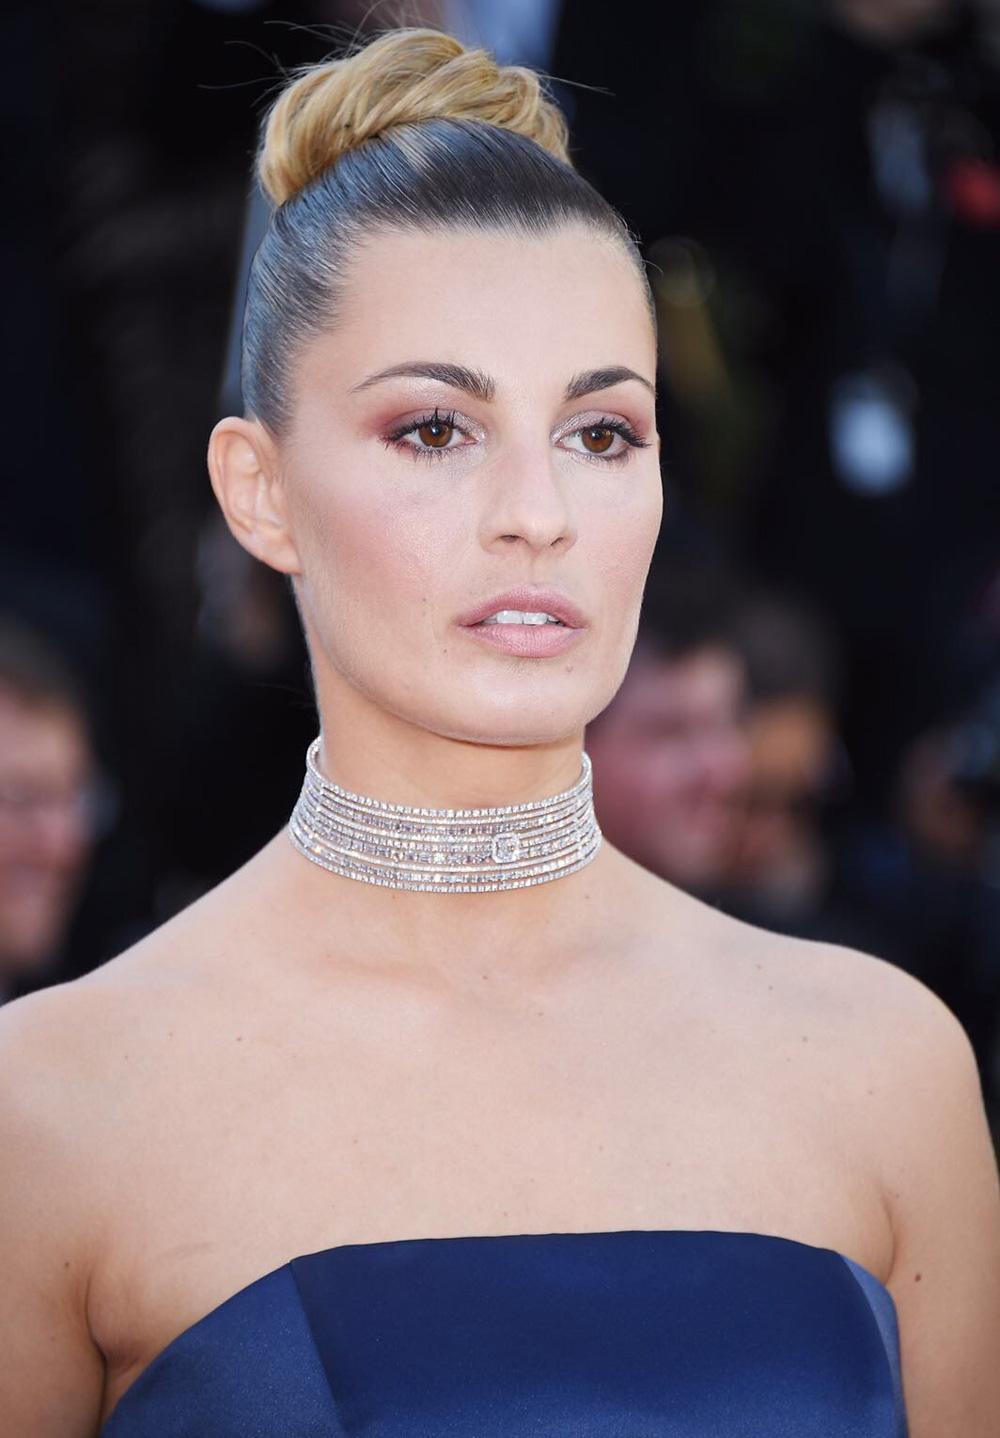 Celebrites Sveva Alviti naked (32 photos), Pussy, Sideboobs, Instagram, panties 2015